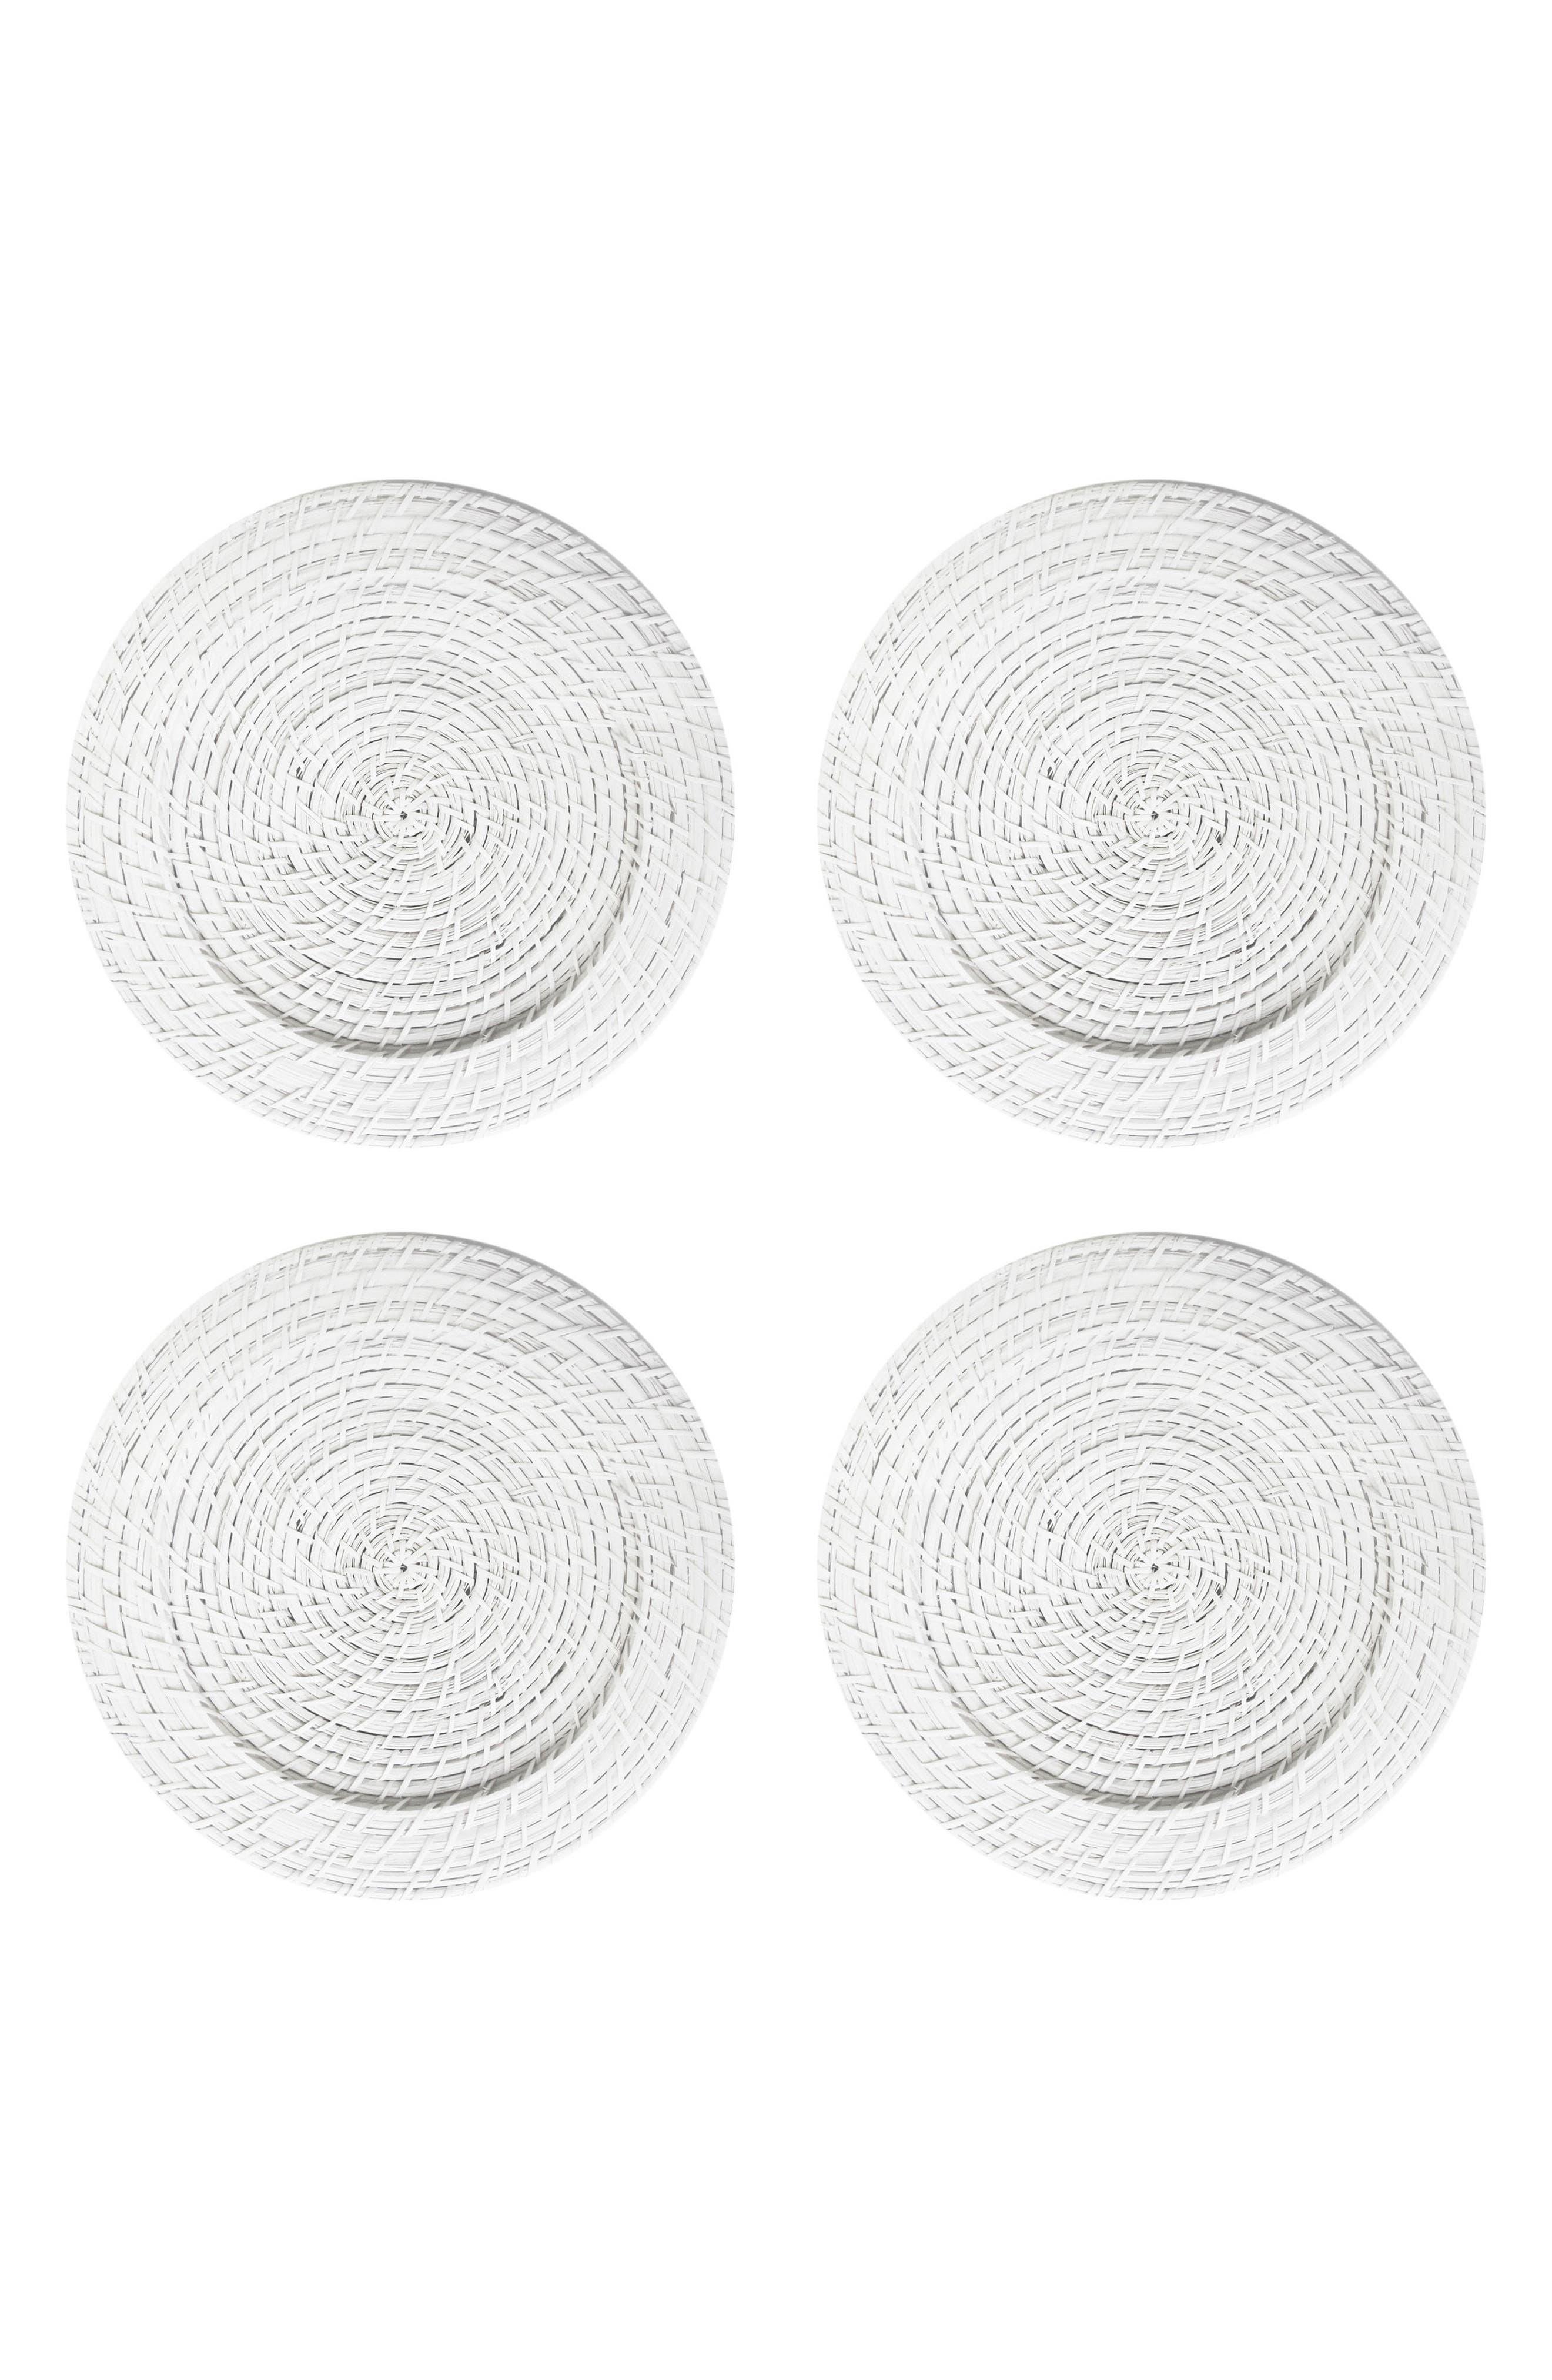 Set of 4 Rattan Charger Plates,                             Main thumbnail 1, color,                             100